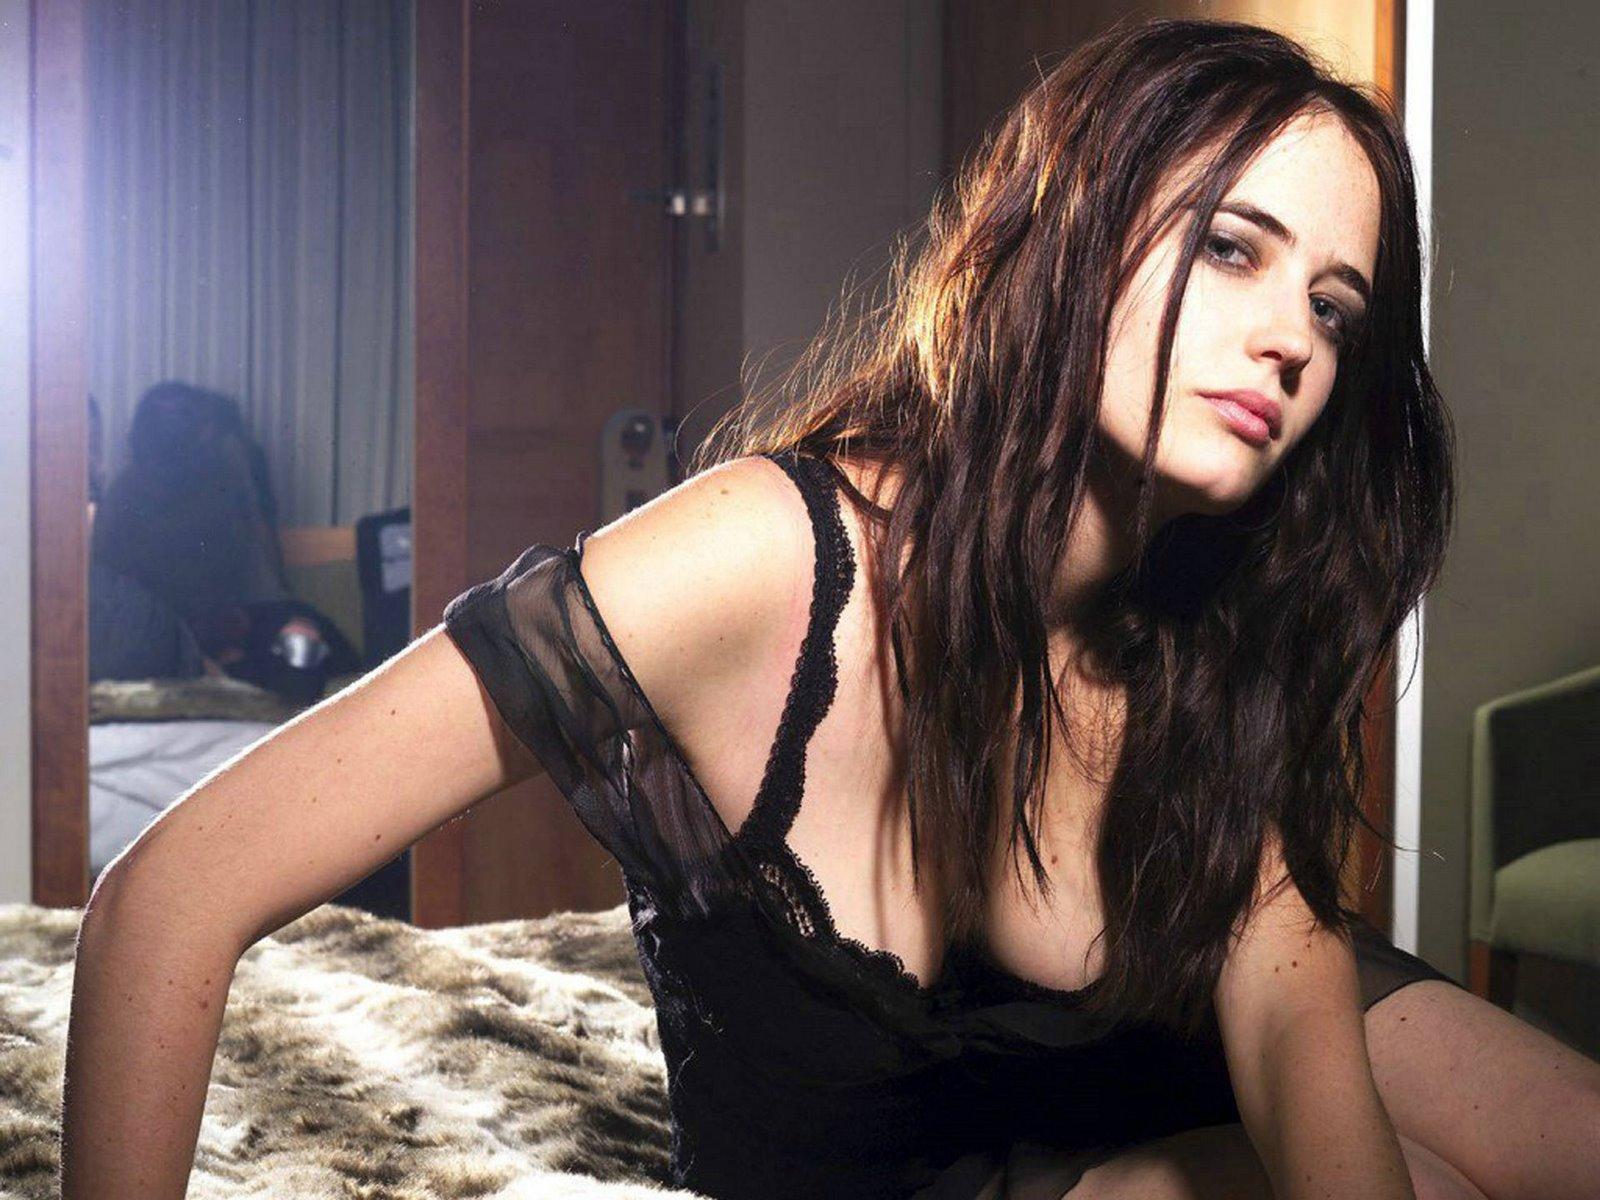 http://1.bp.blogspot.com/-xqAvD-oP8P4/TyLWQRyflKI/AAAAAAAAI_k/Nc78KTTd1PY/s1600/Eva+Green+Hot4.jpg